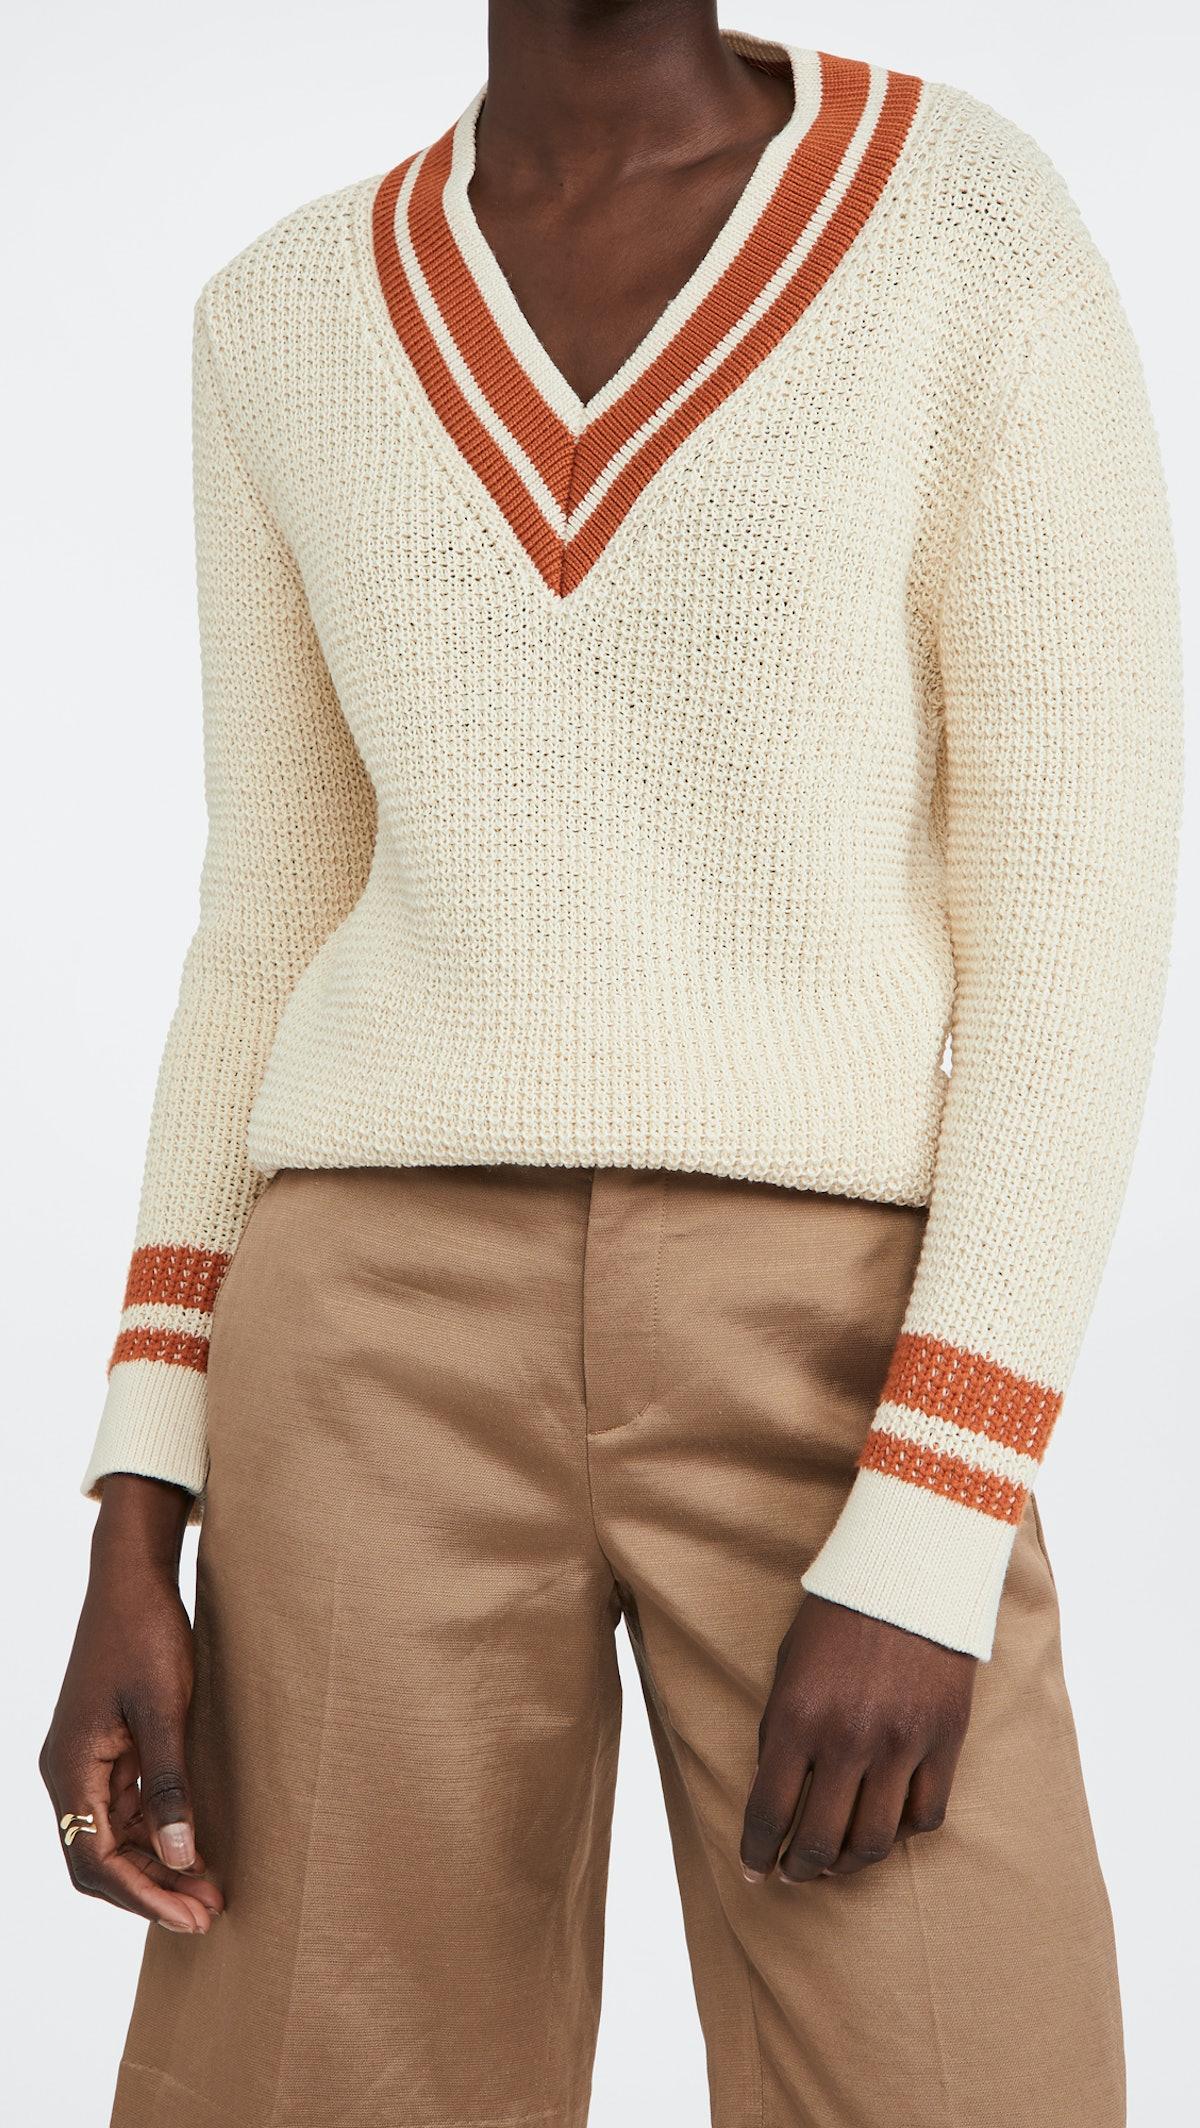 Vintage Cricket Sweater